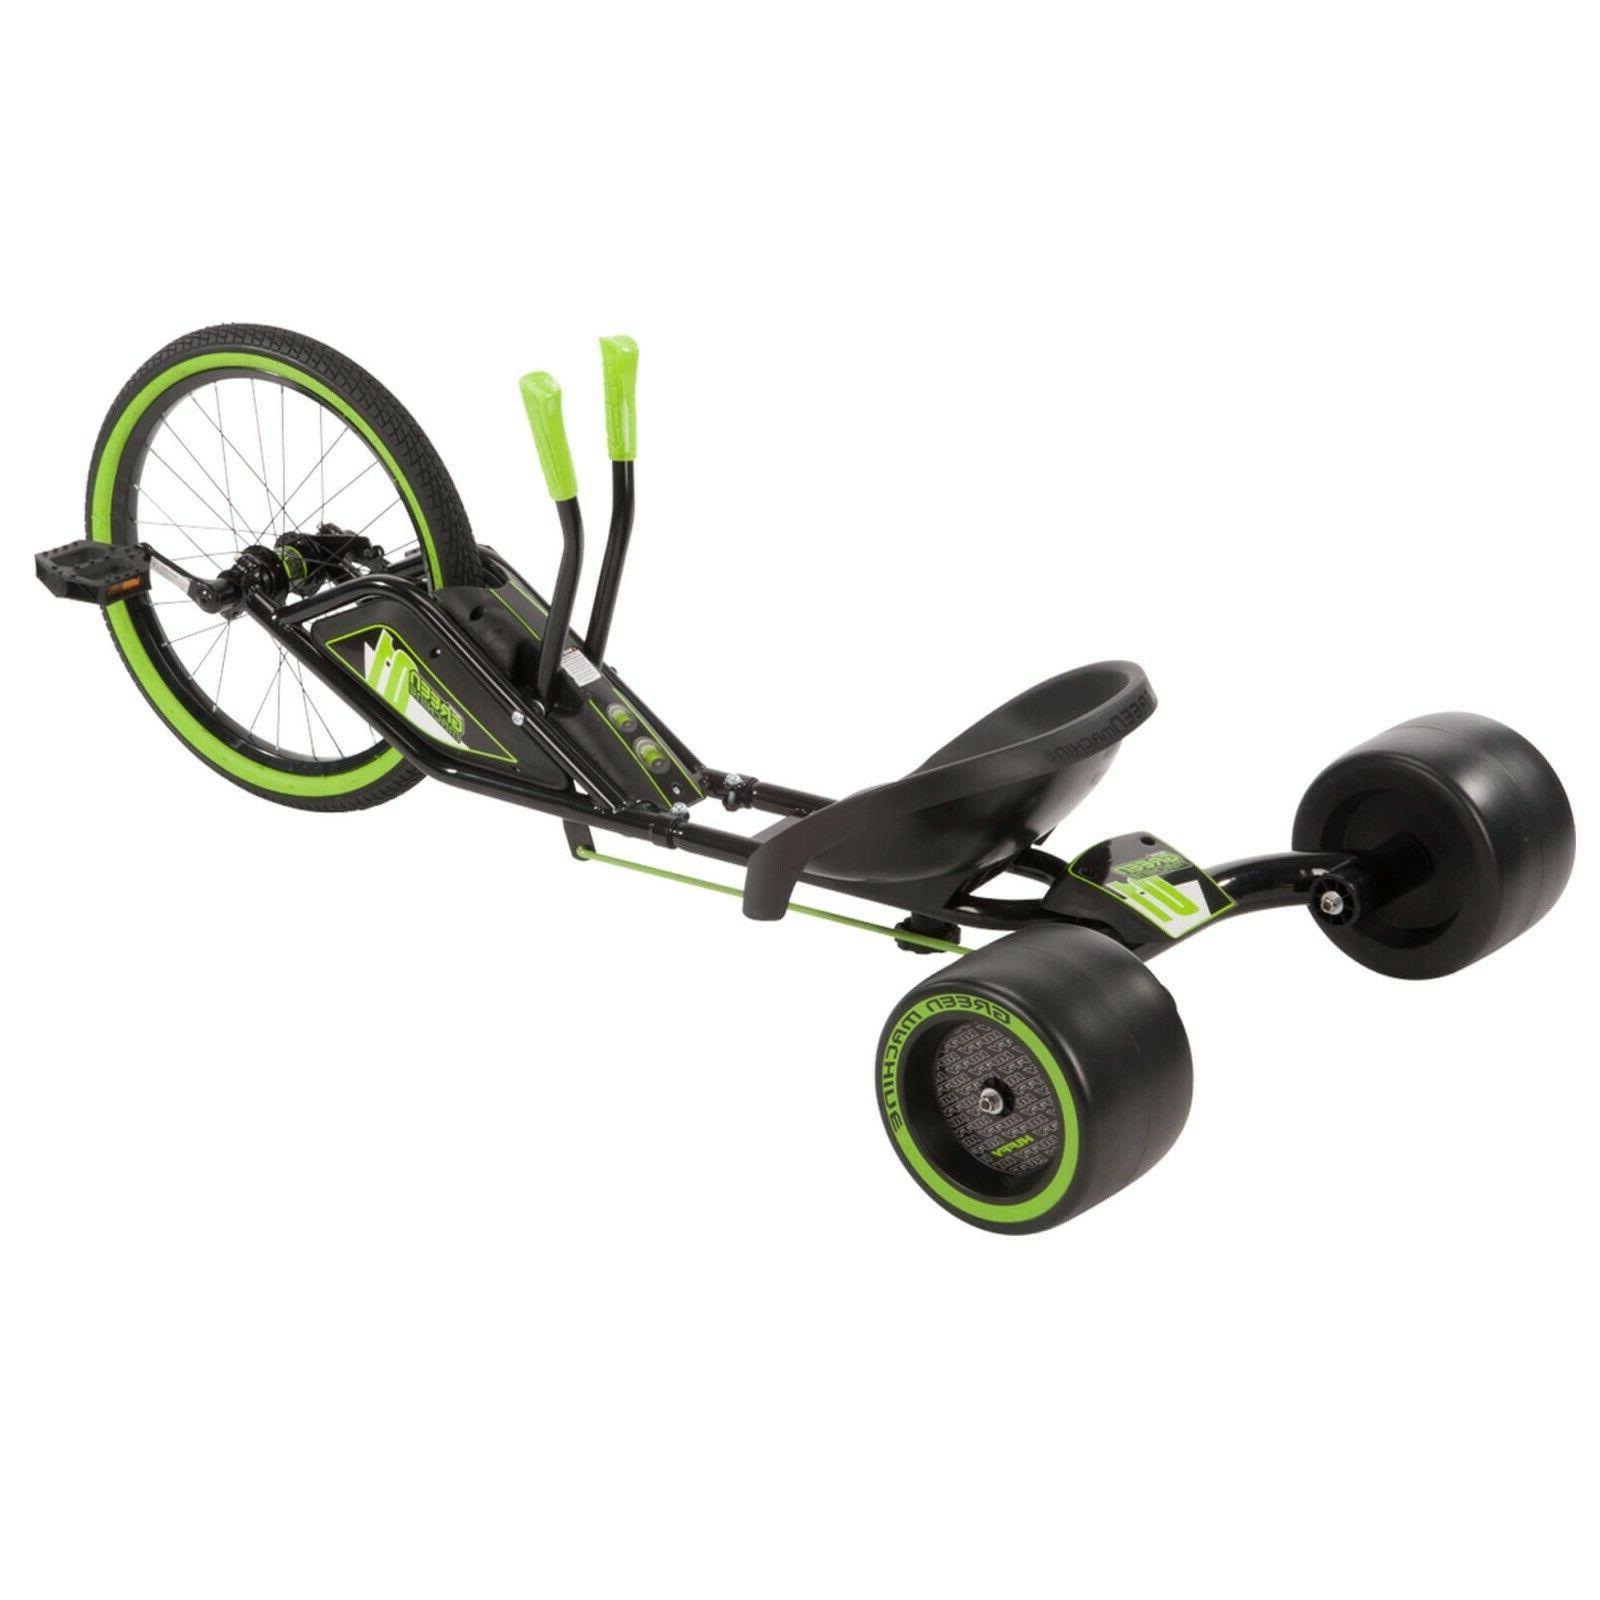 Huffy Green 3 Inch Wheel Powered